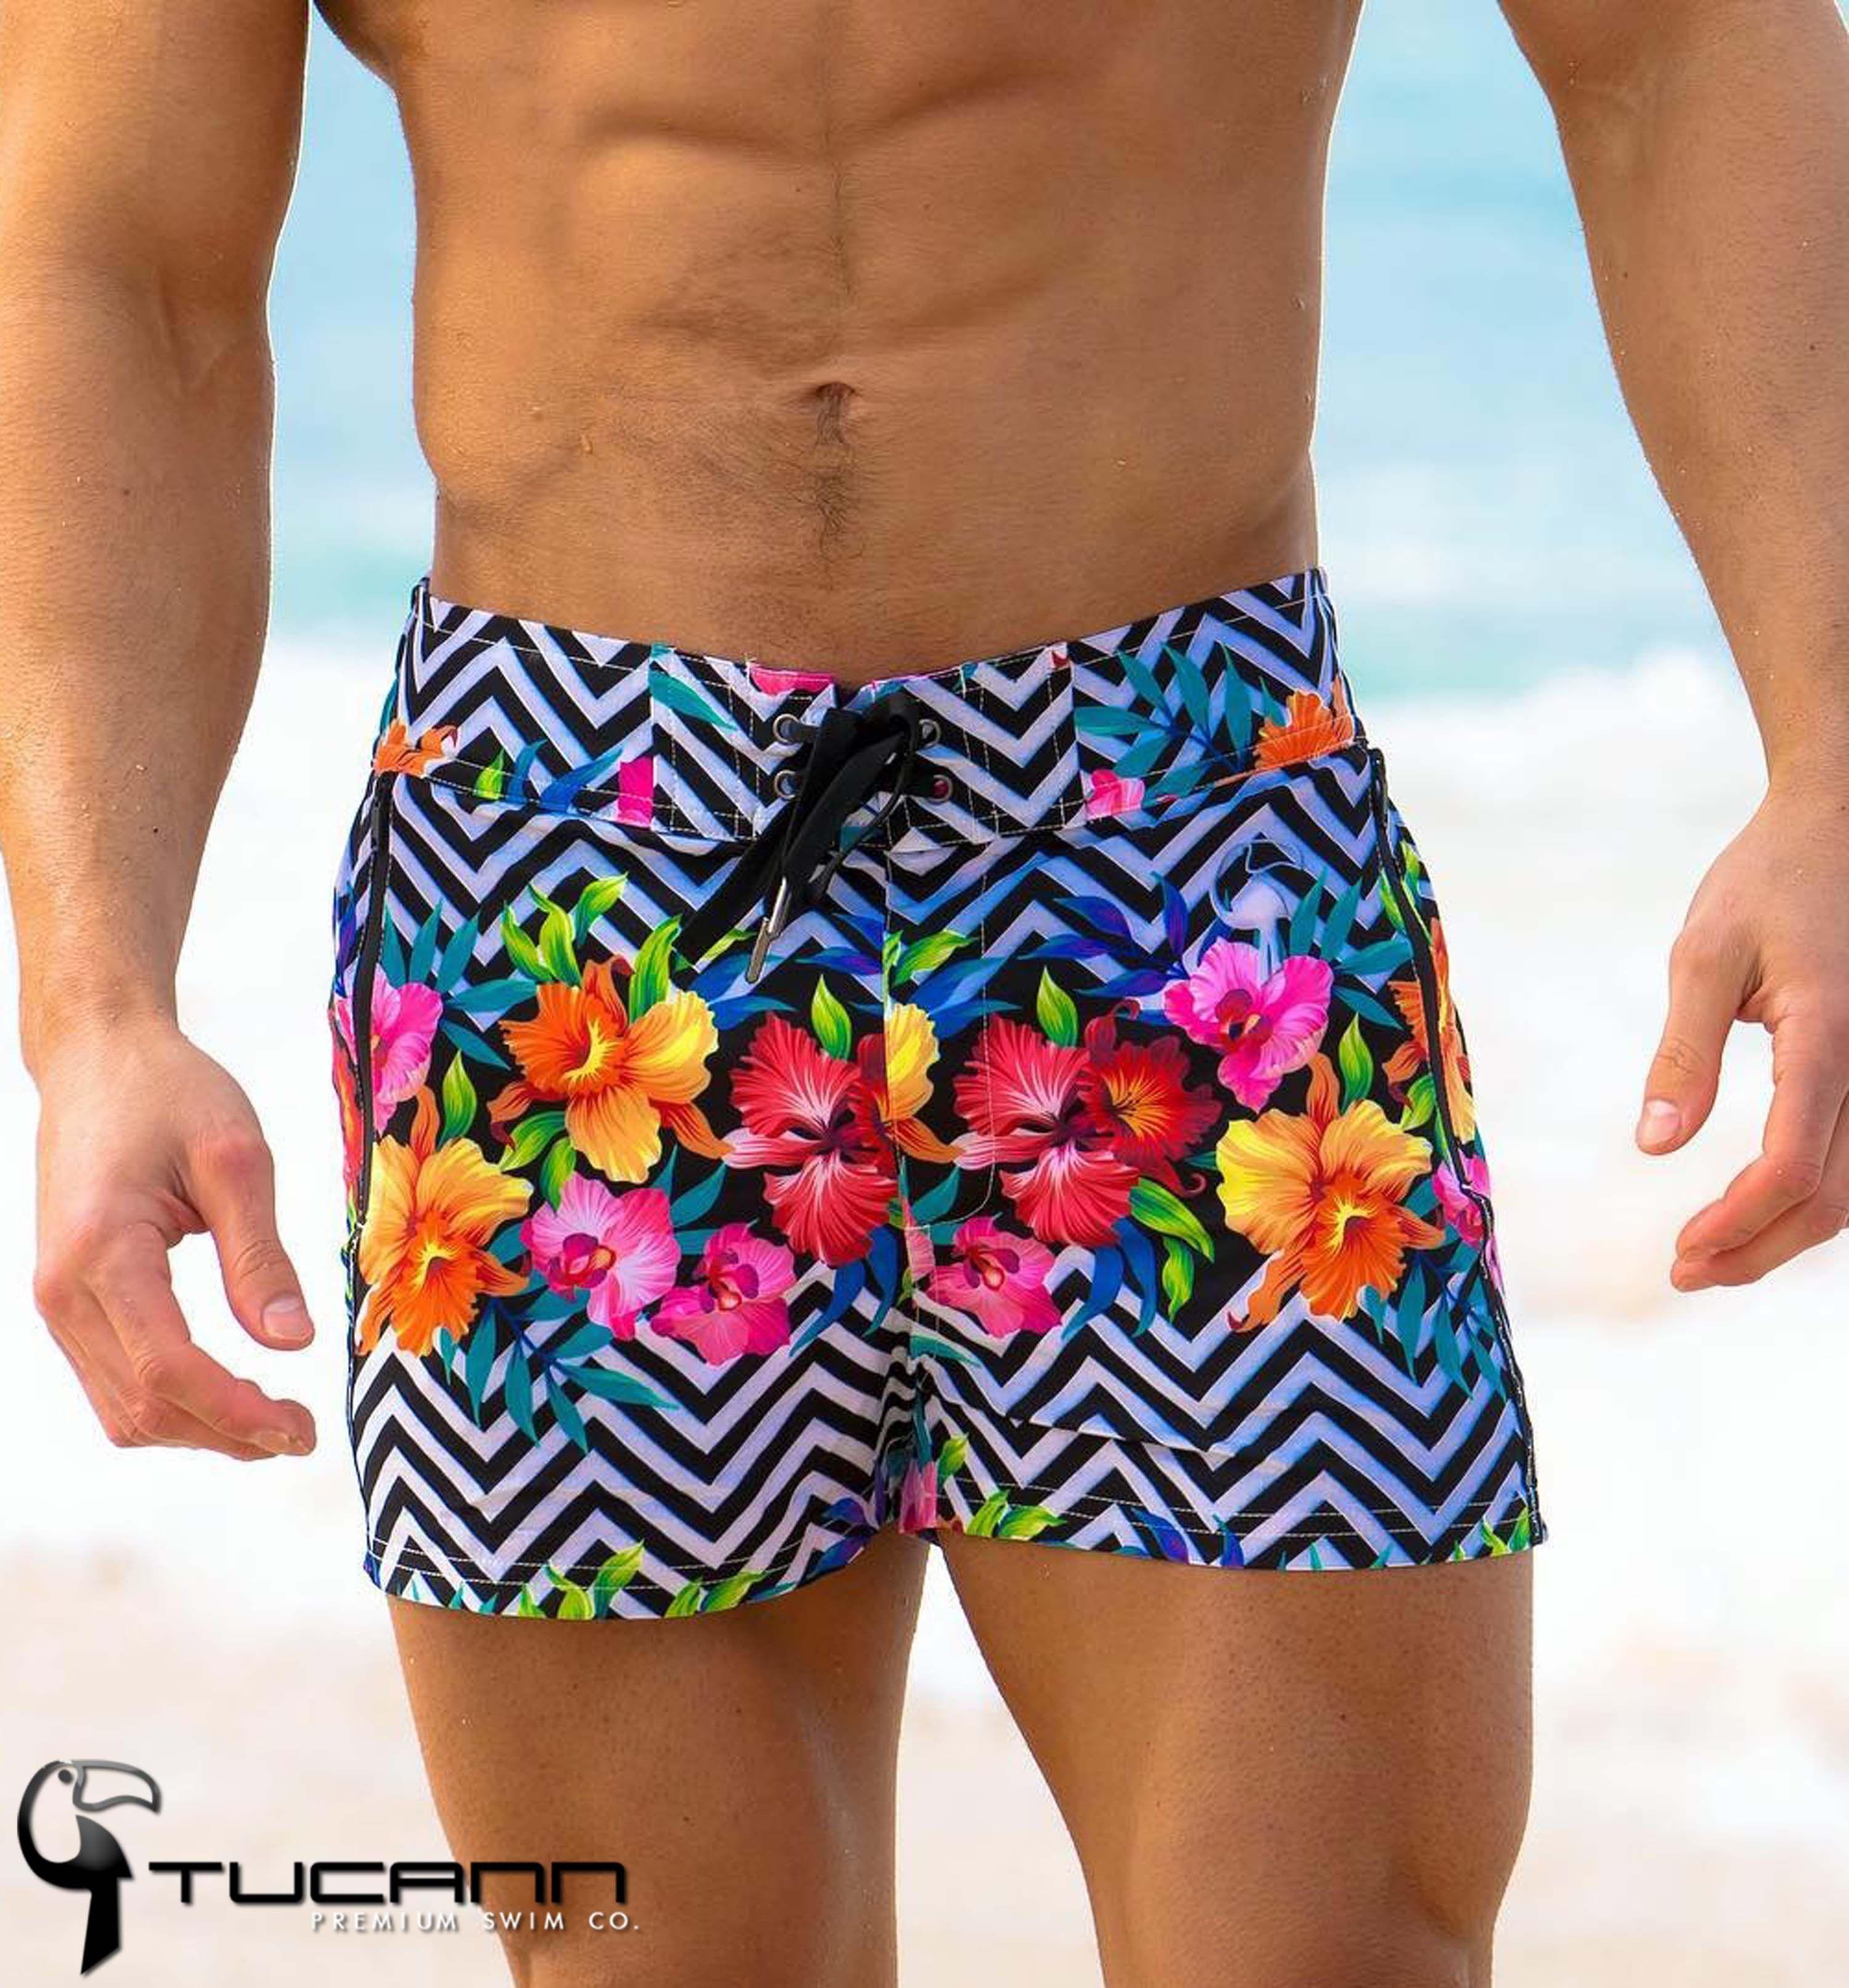 Tucann Mens Swim Trunks Beach Swimming Shorts Quick Dry Printed Bathing Suits Swimwear with Pockets